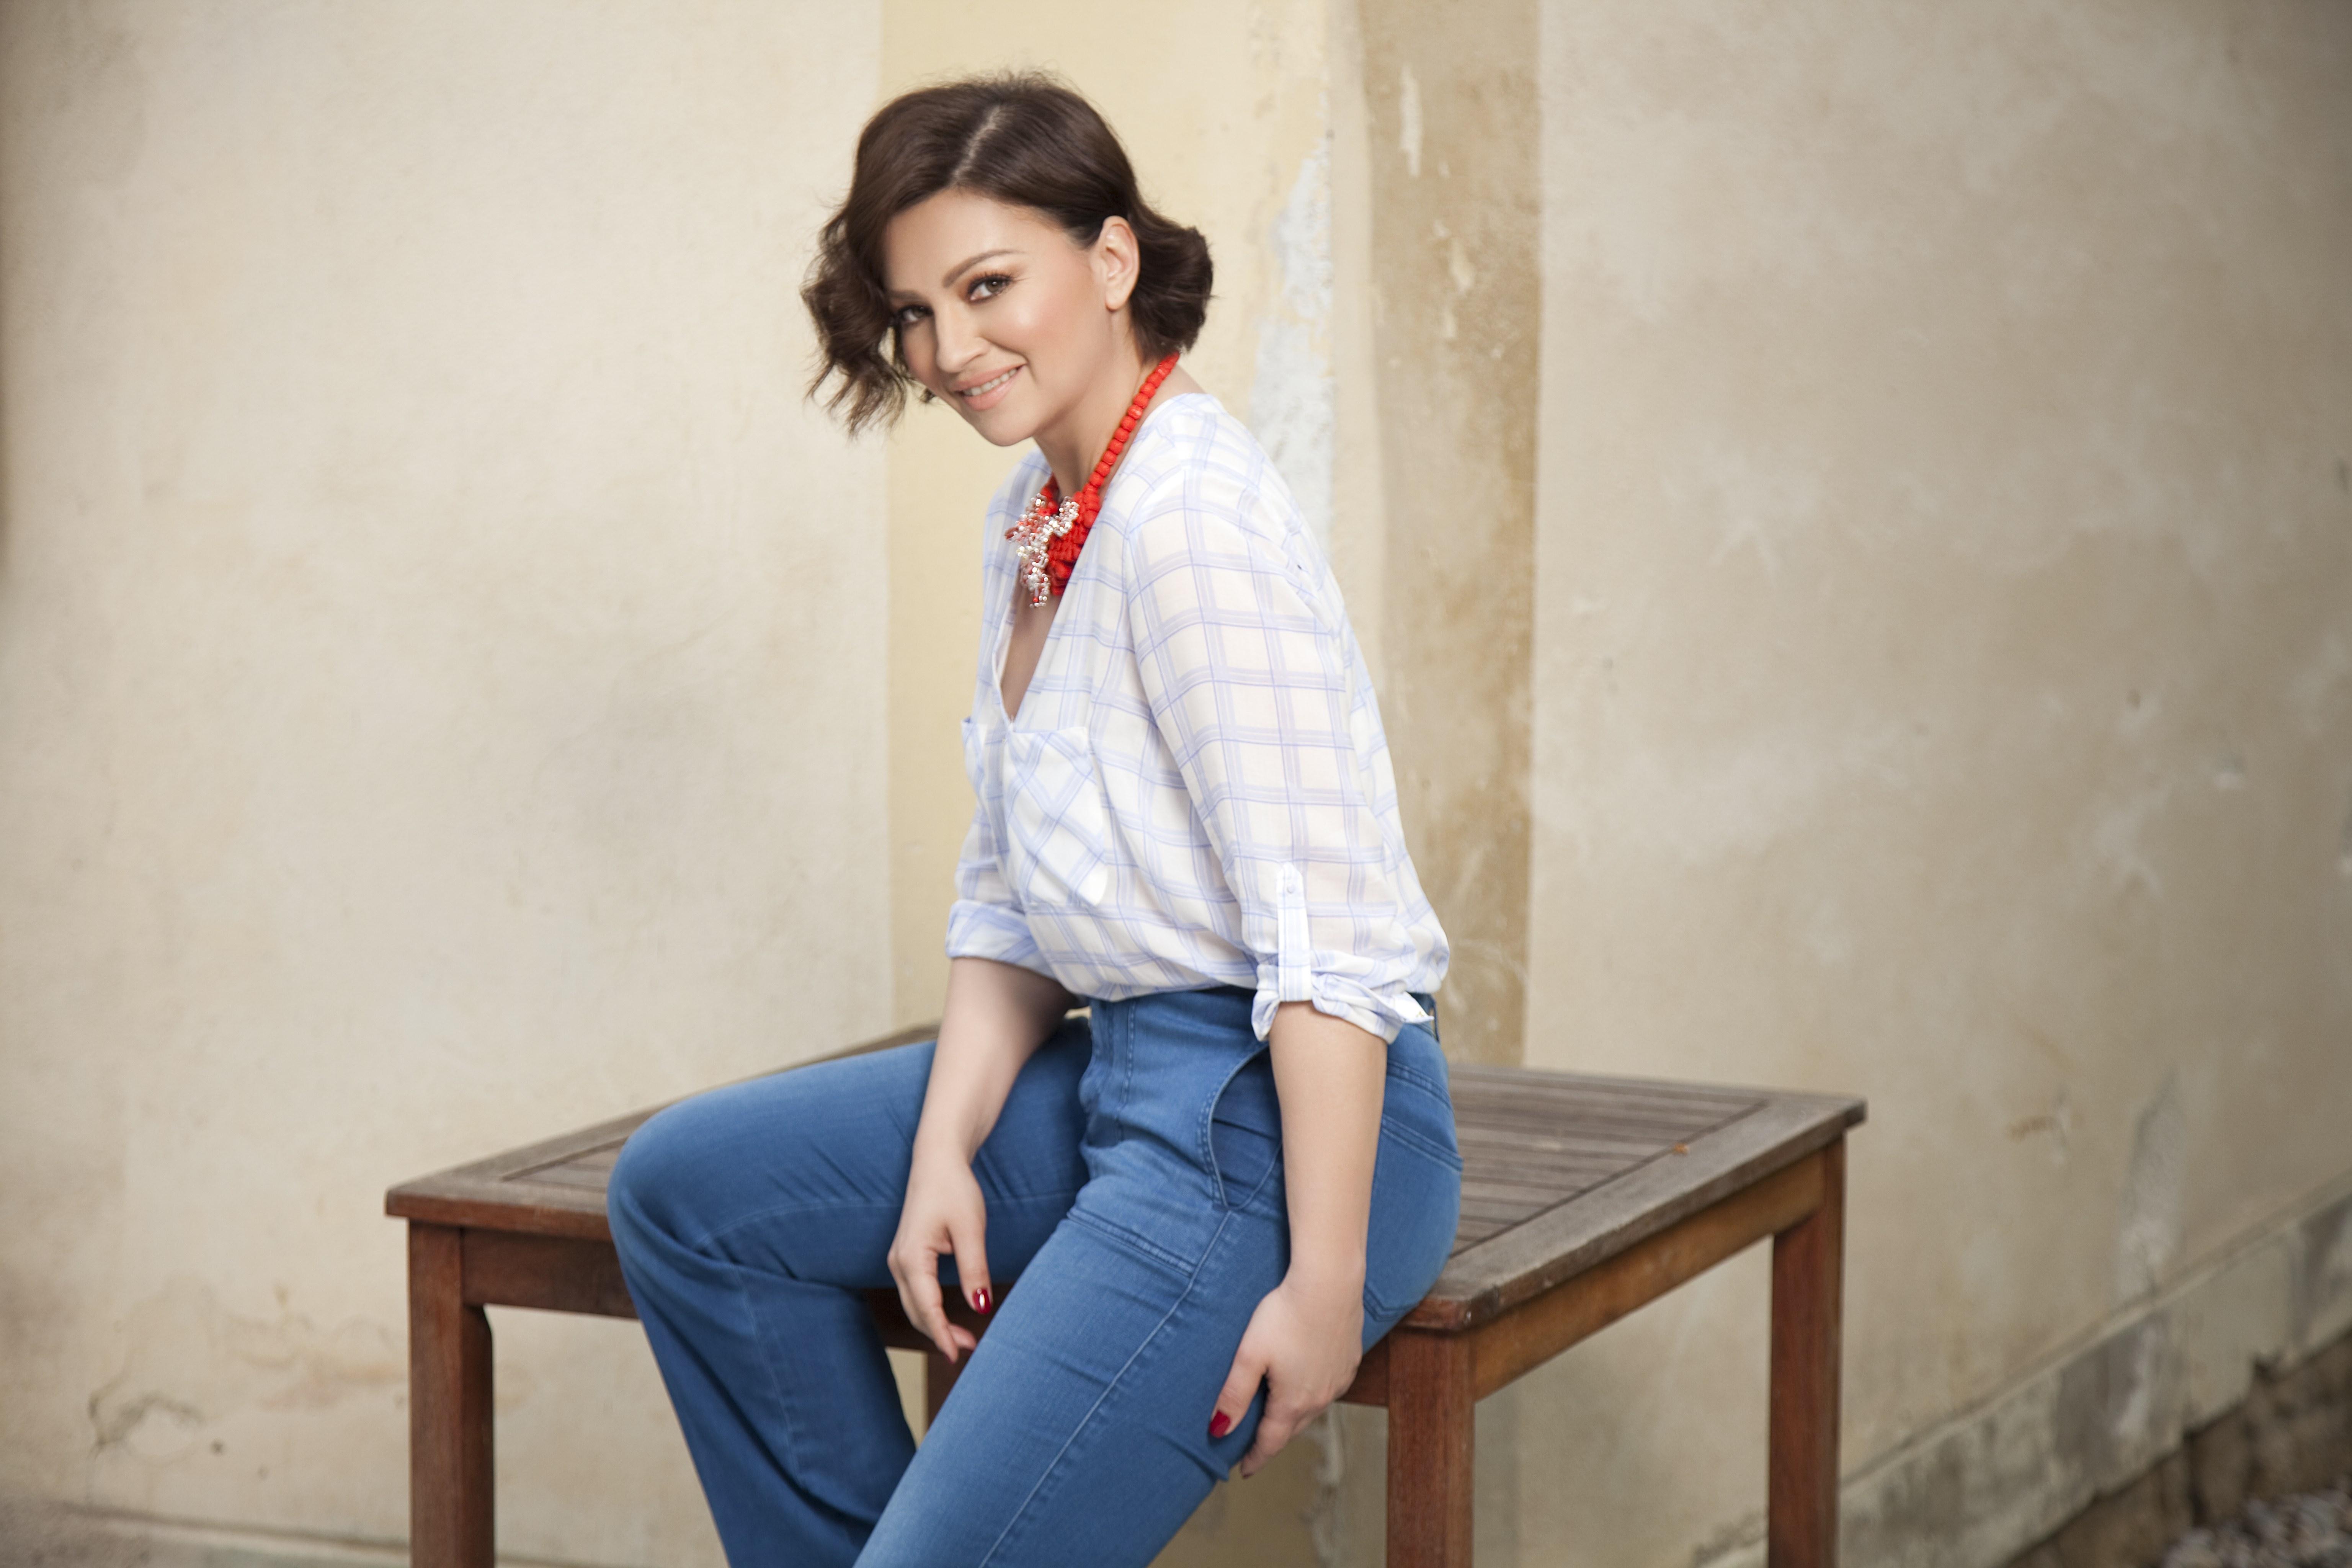 Nina Badric 24 - photo Sever Zolak